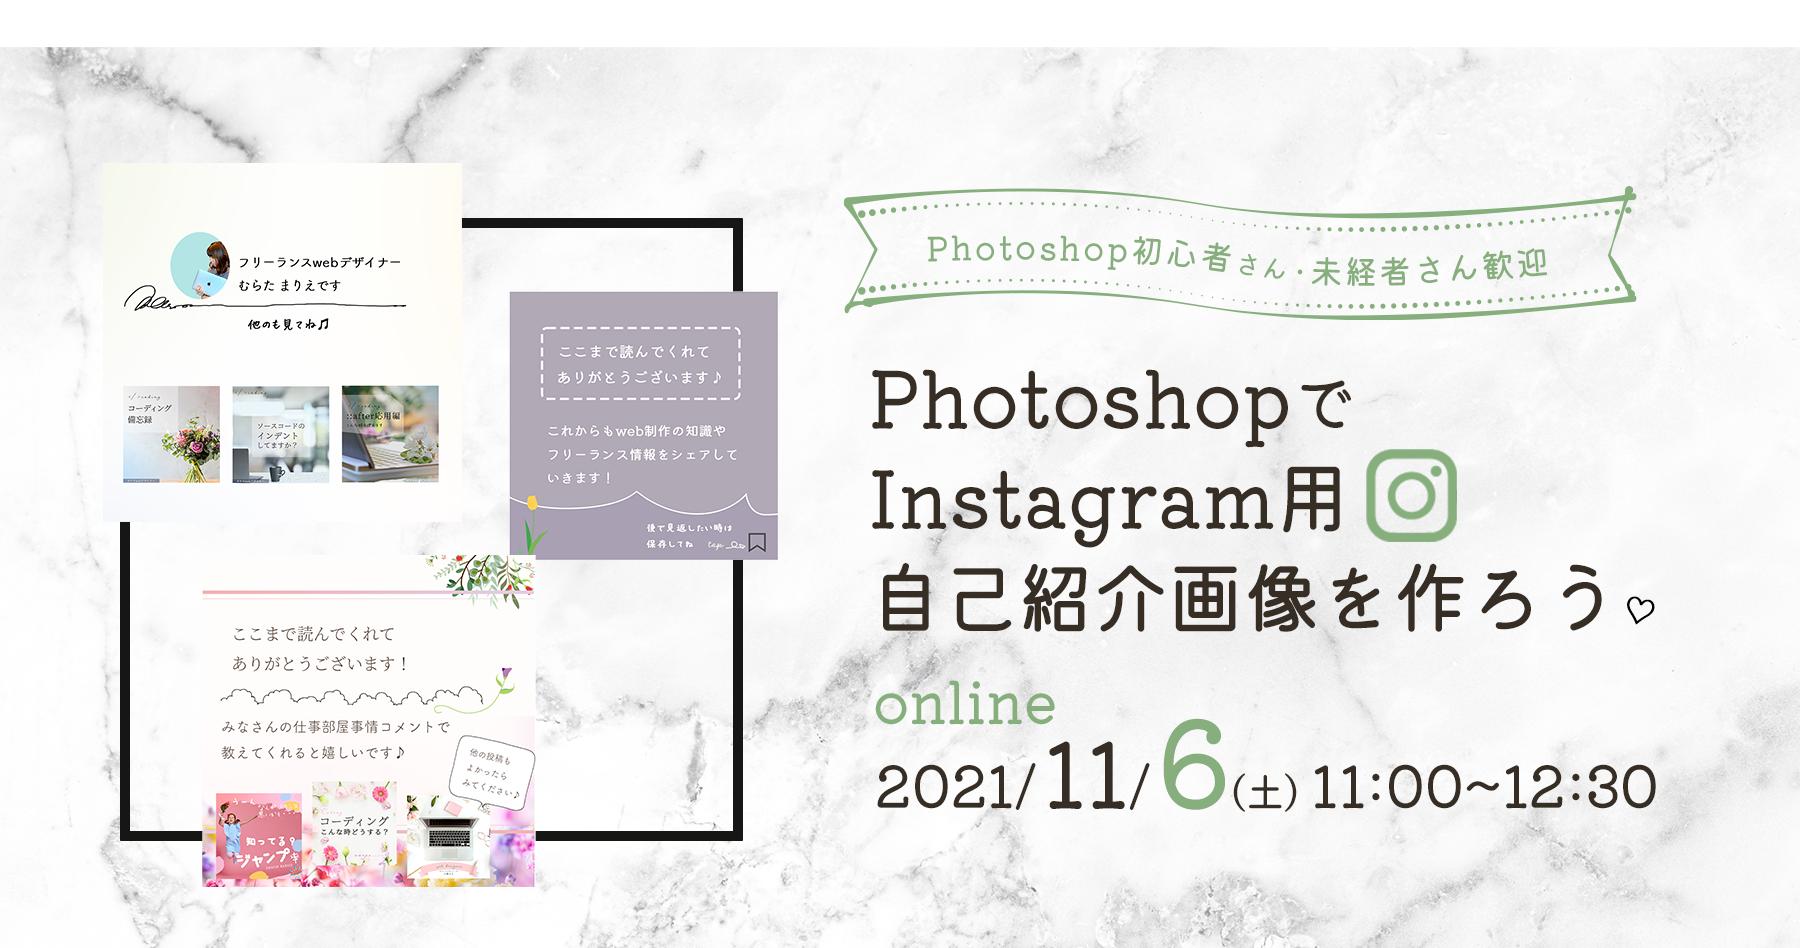 Photoshopで Instagram用 自己紹介画像を作ろう